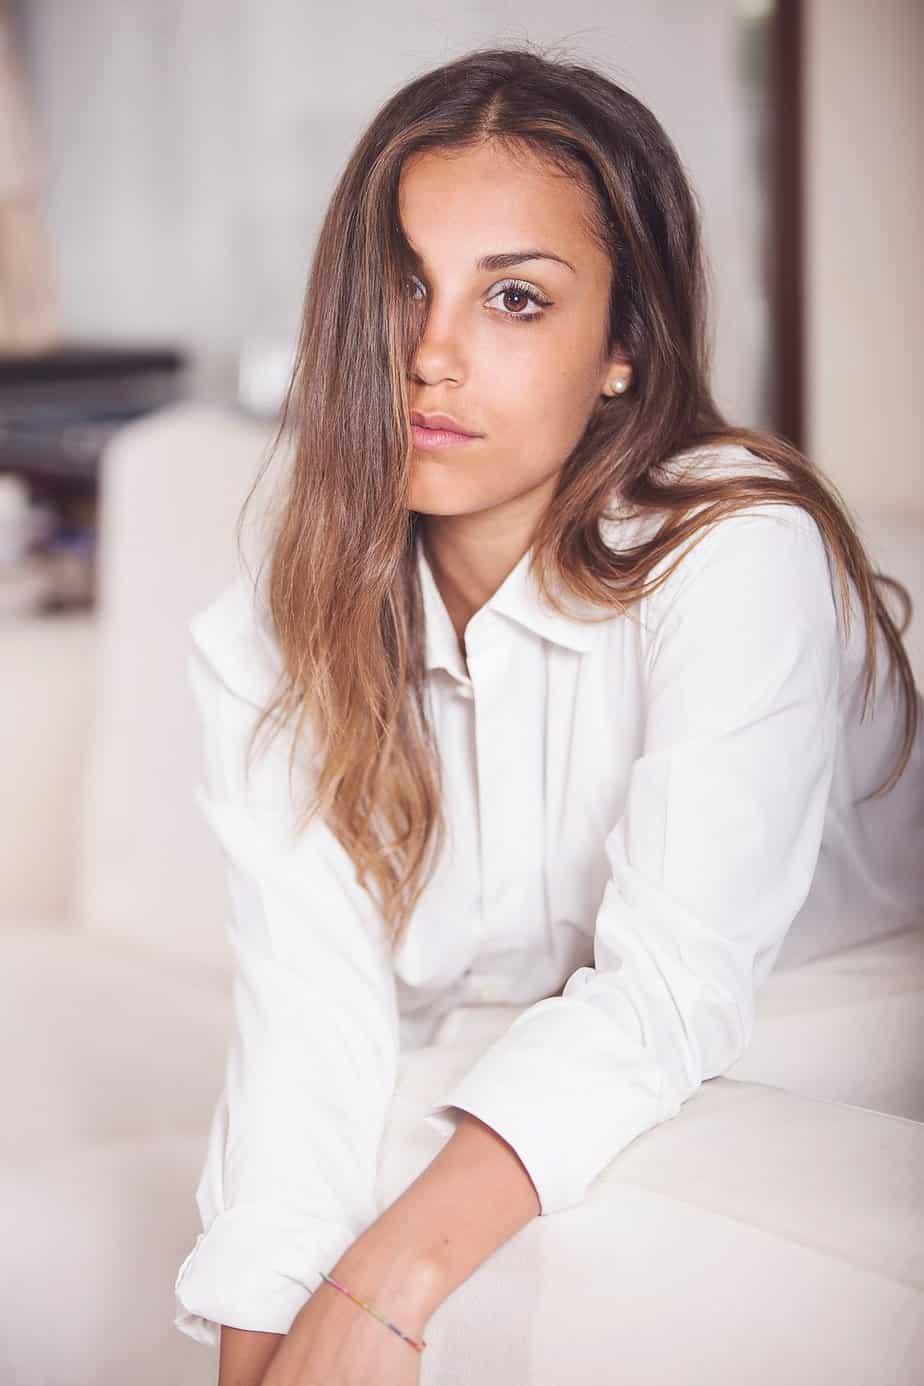 Anna_Model_francescabandiera